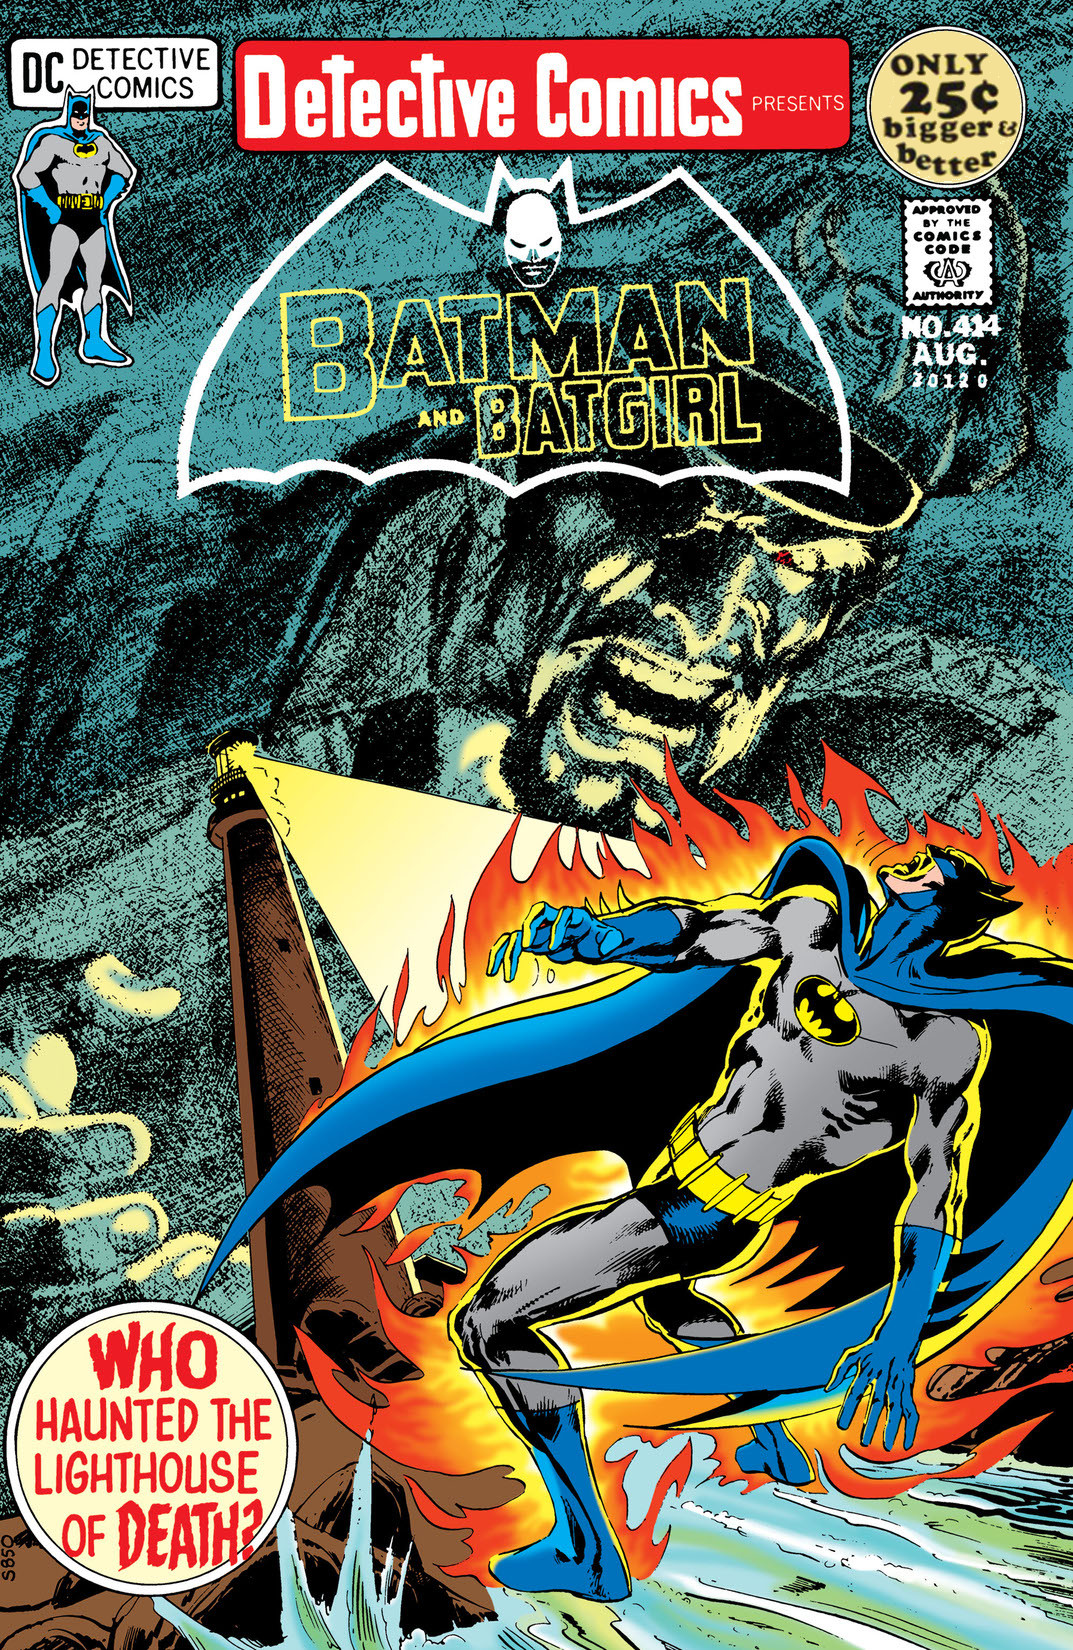 File:Detective Comics Vol 1-414 Cover-1.jpg